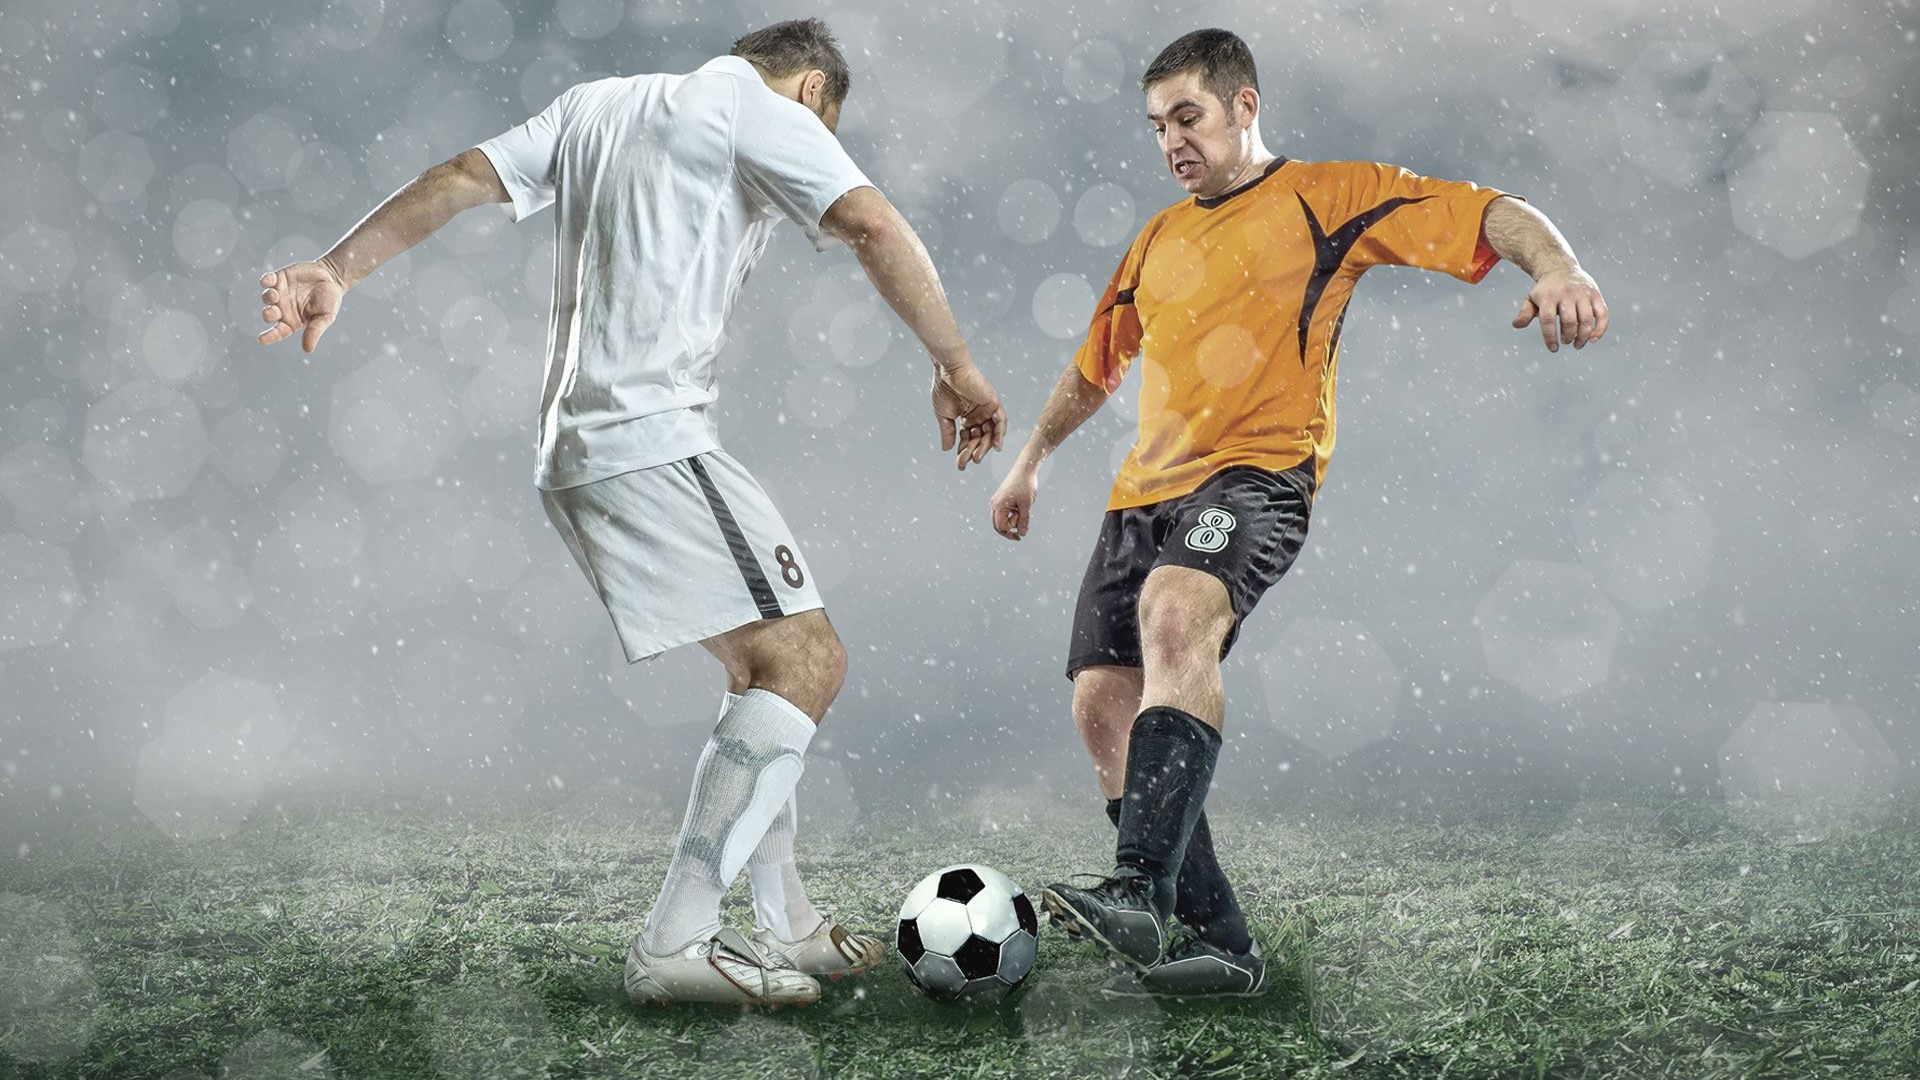 watch-edinburgh-vs-ulster-rugby-online